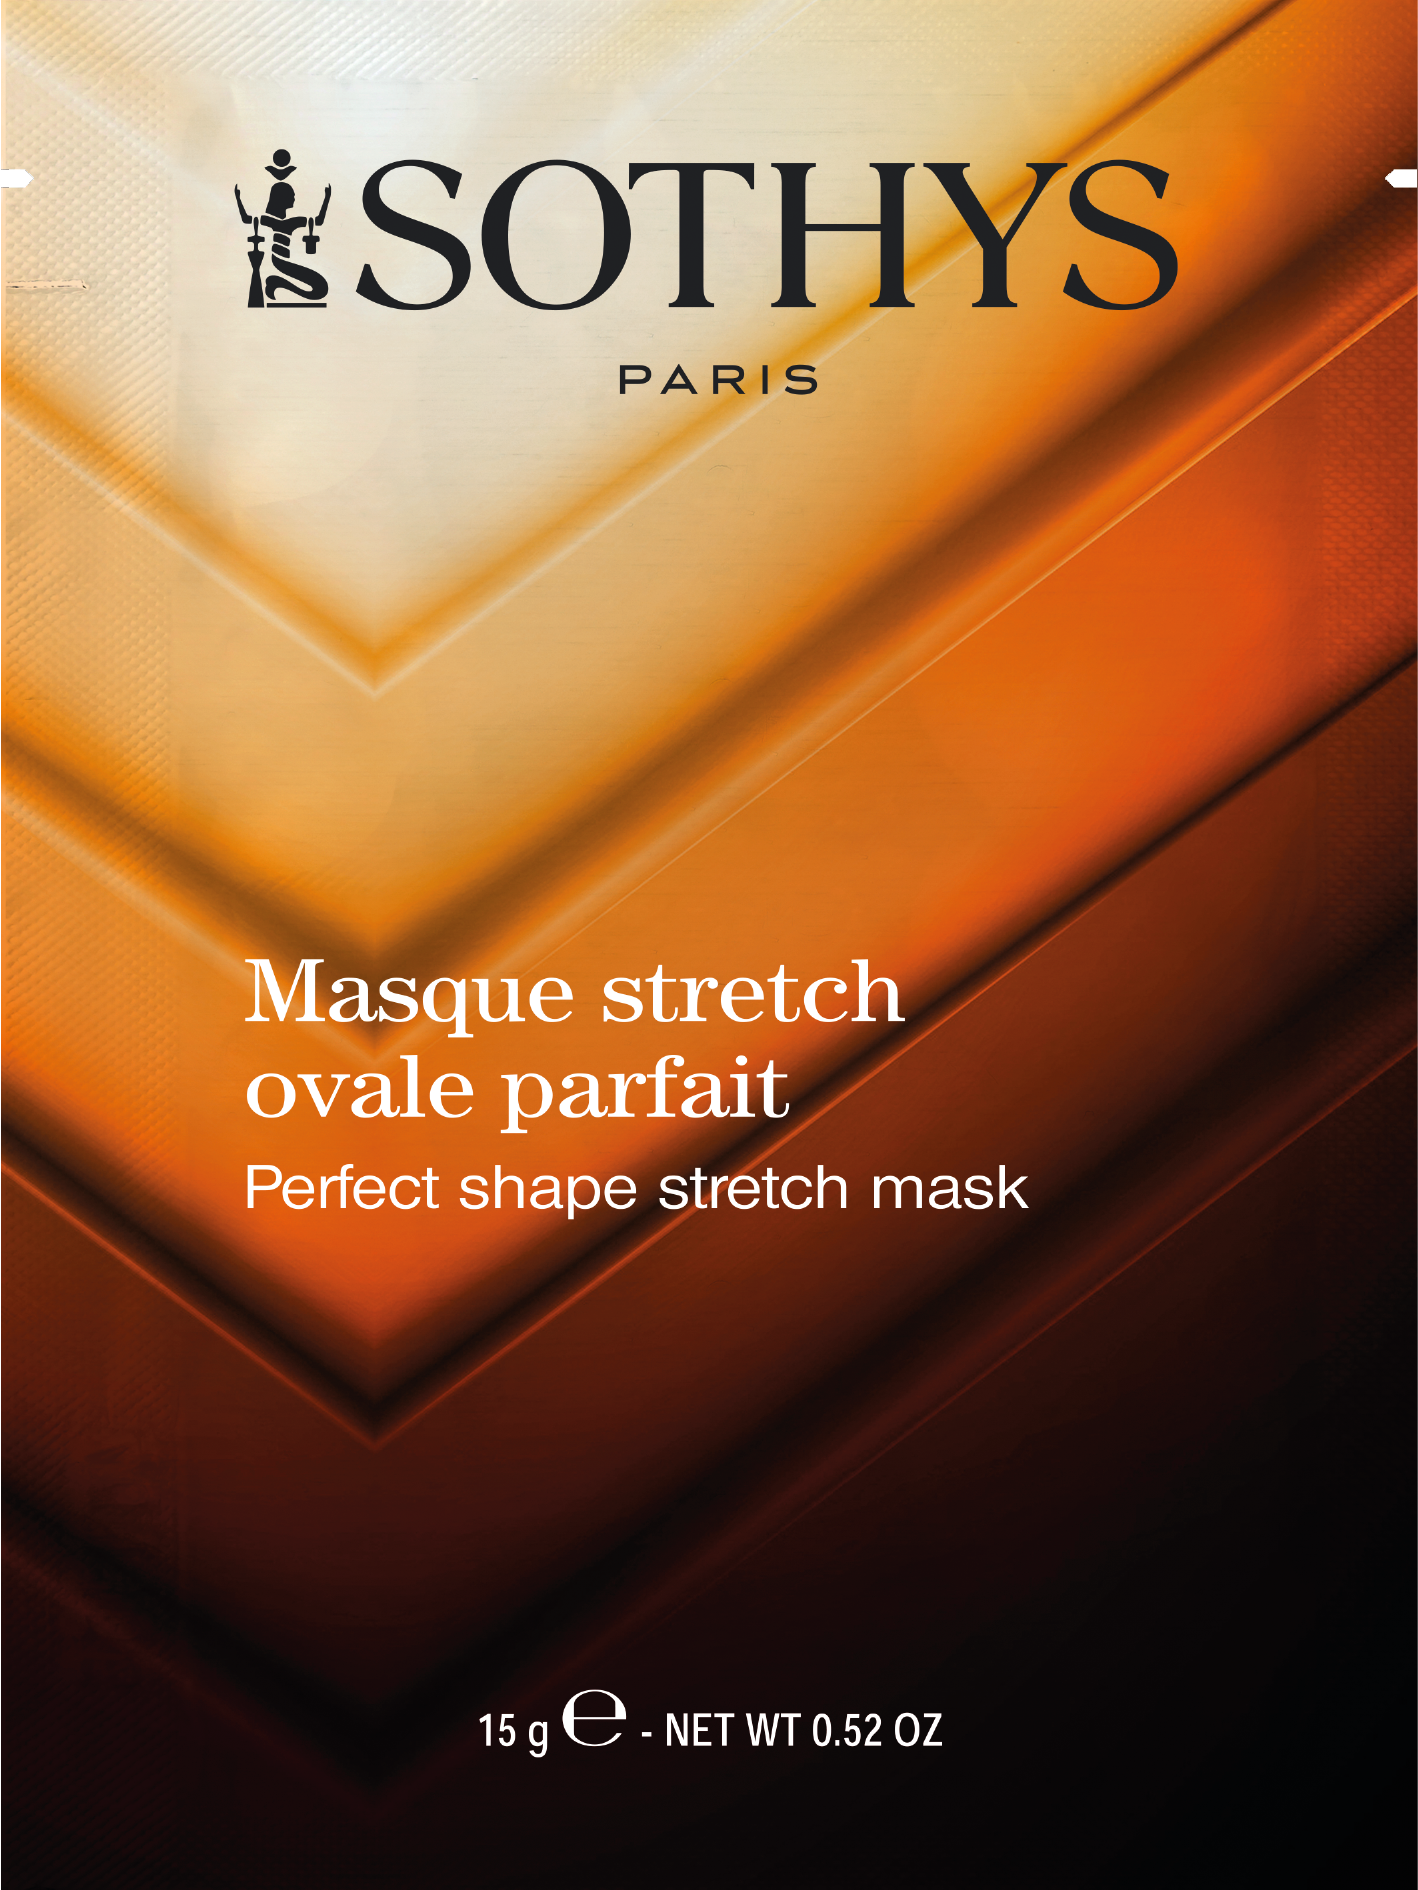 Sothys Masque Stretch ovale parfait